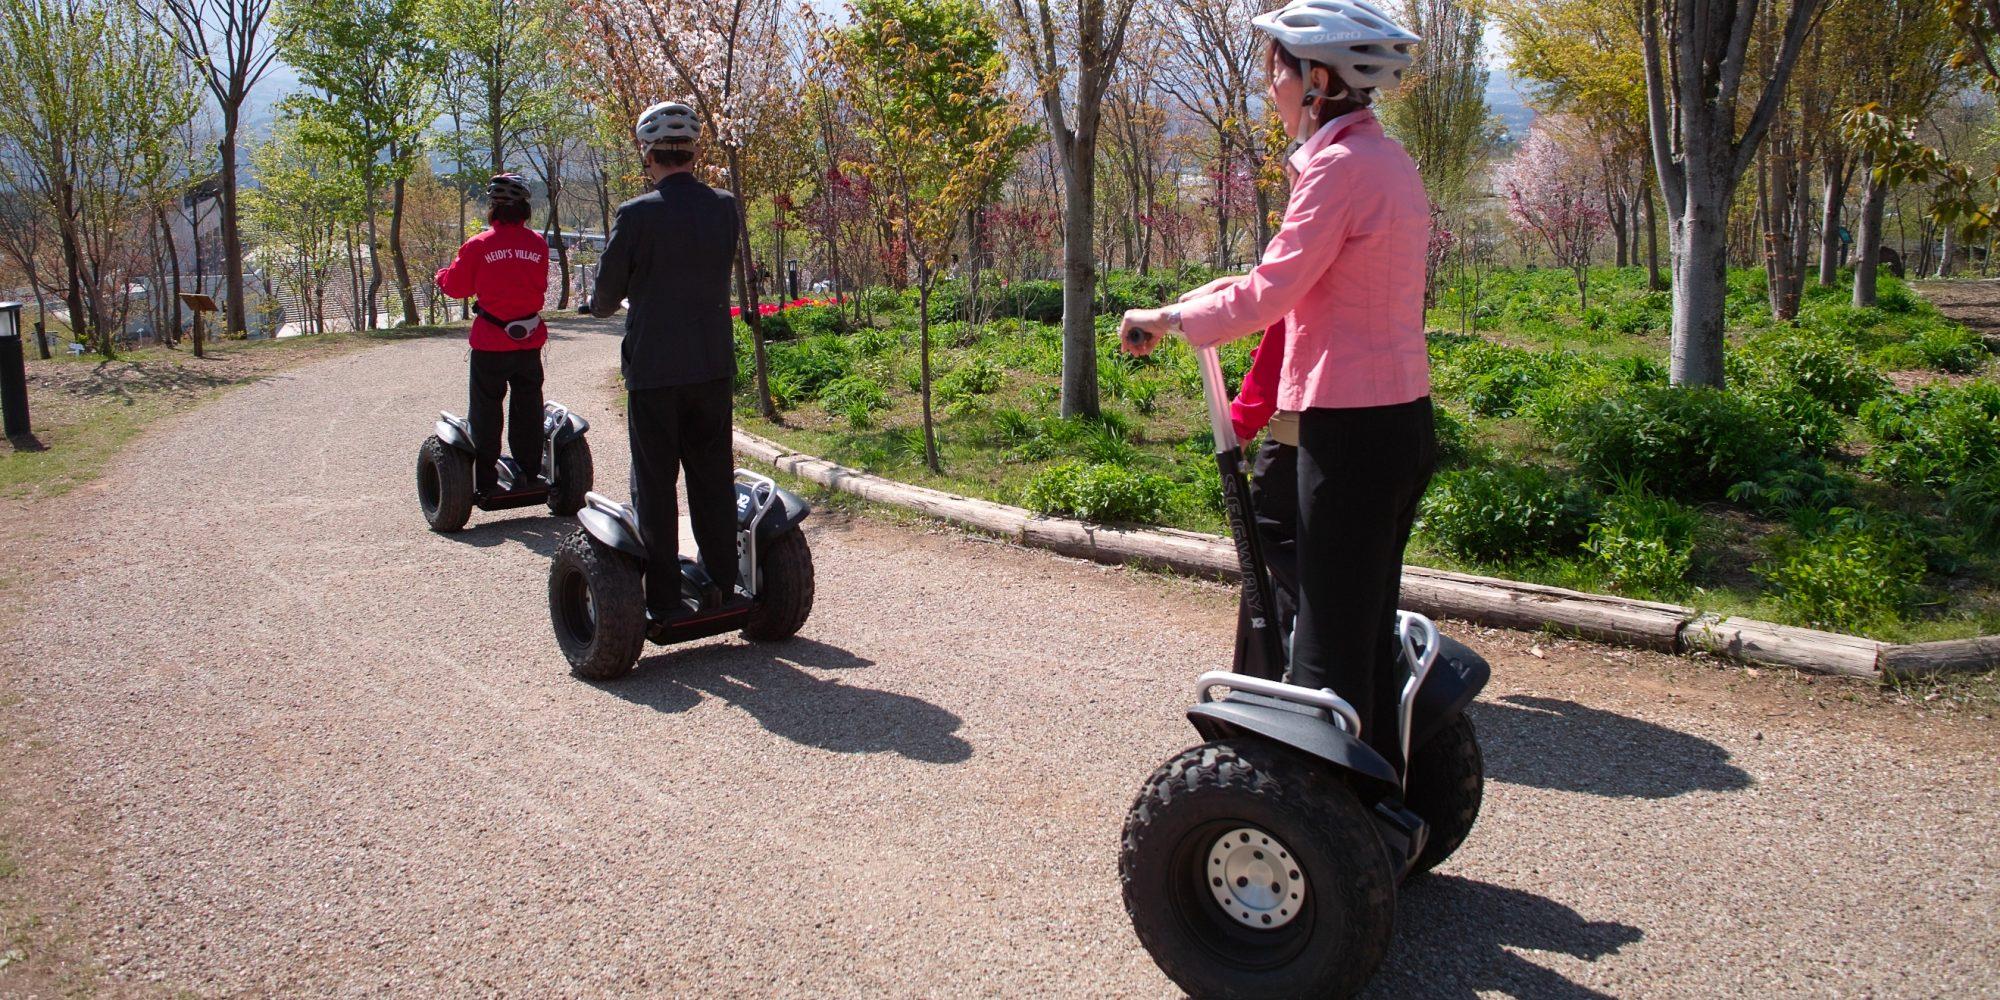 Segway 停止生產其自平衡兩輪車。下一步是什麼?